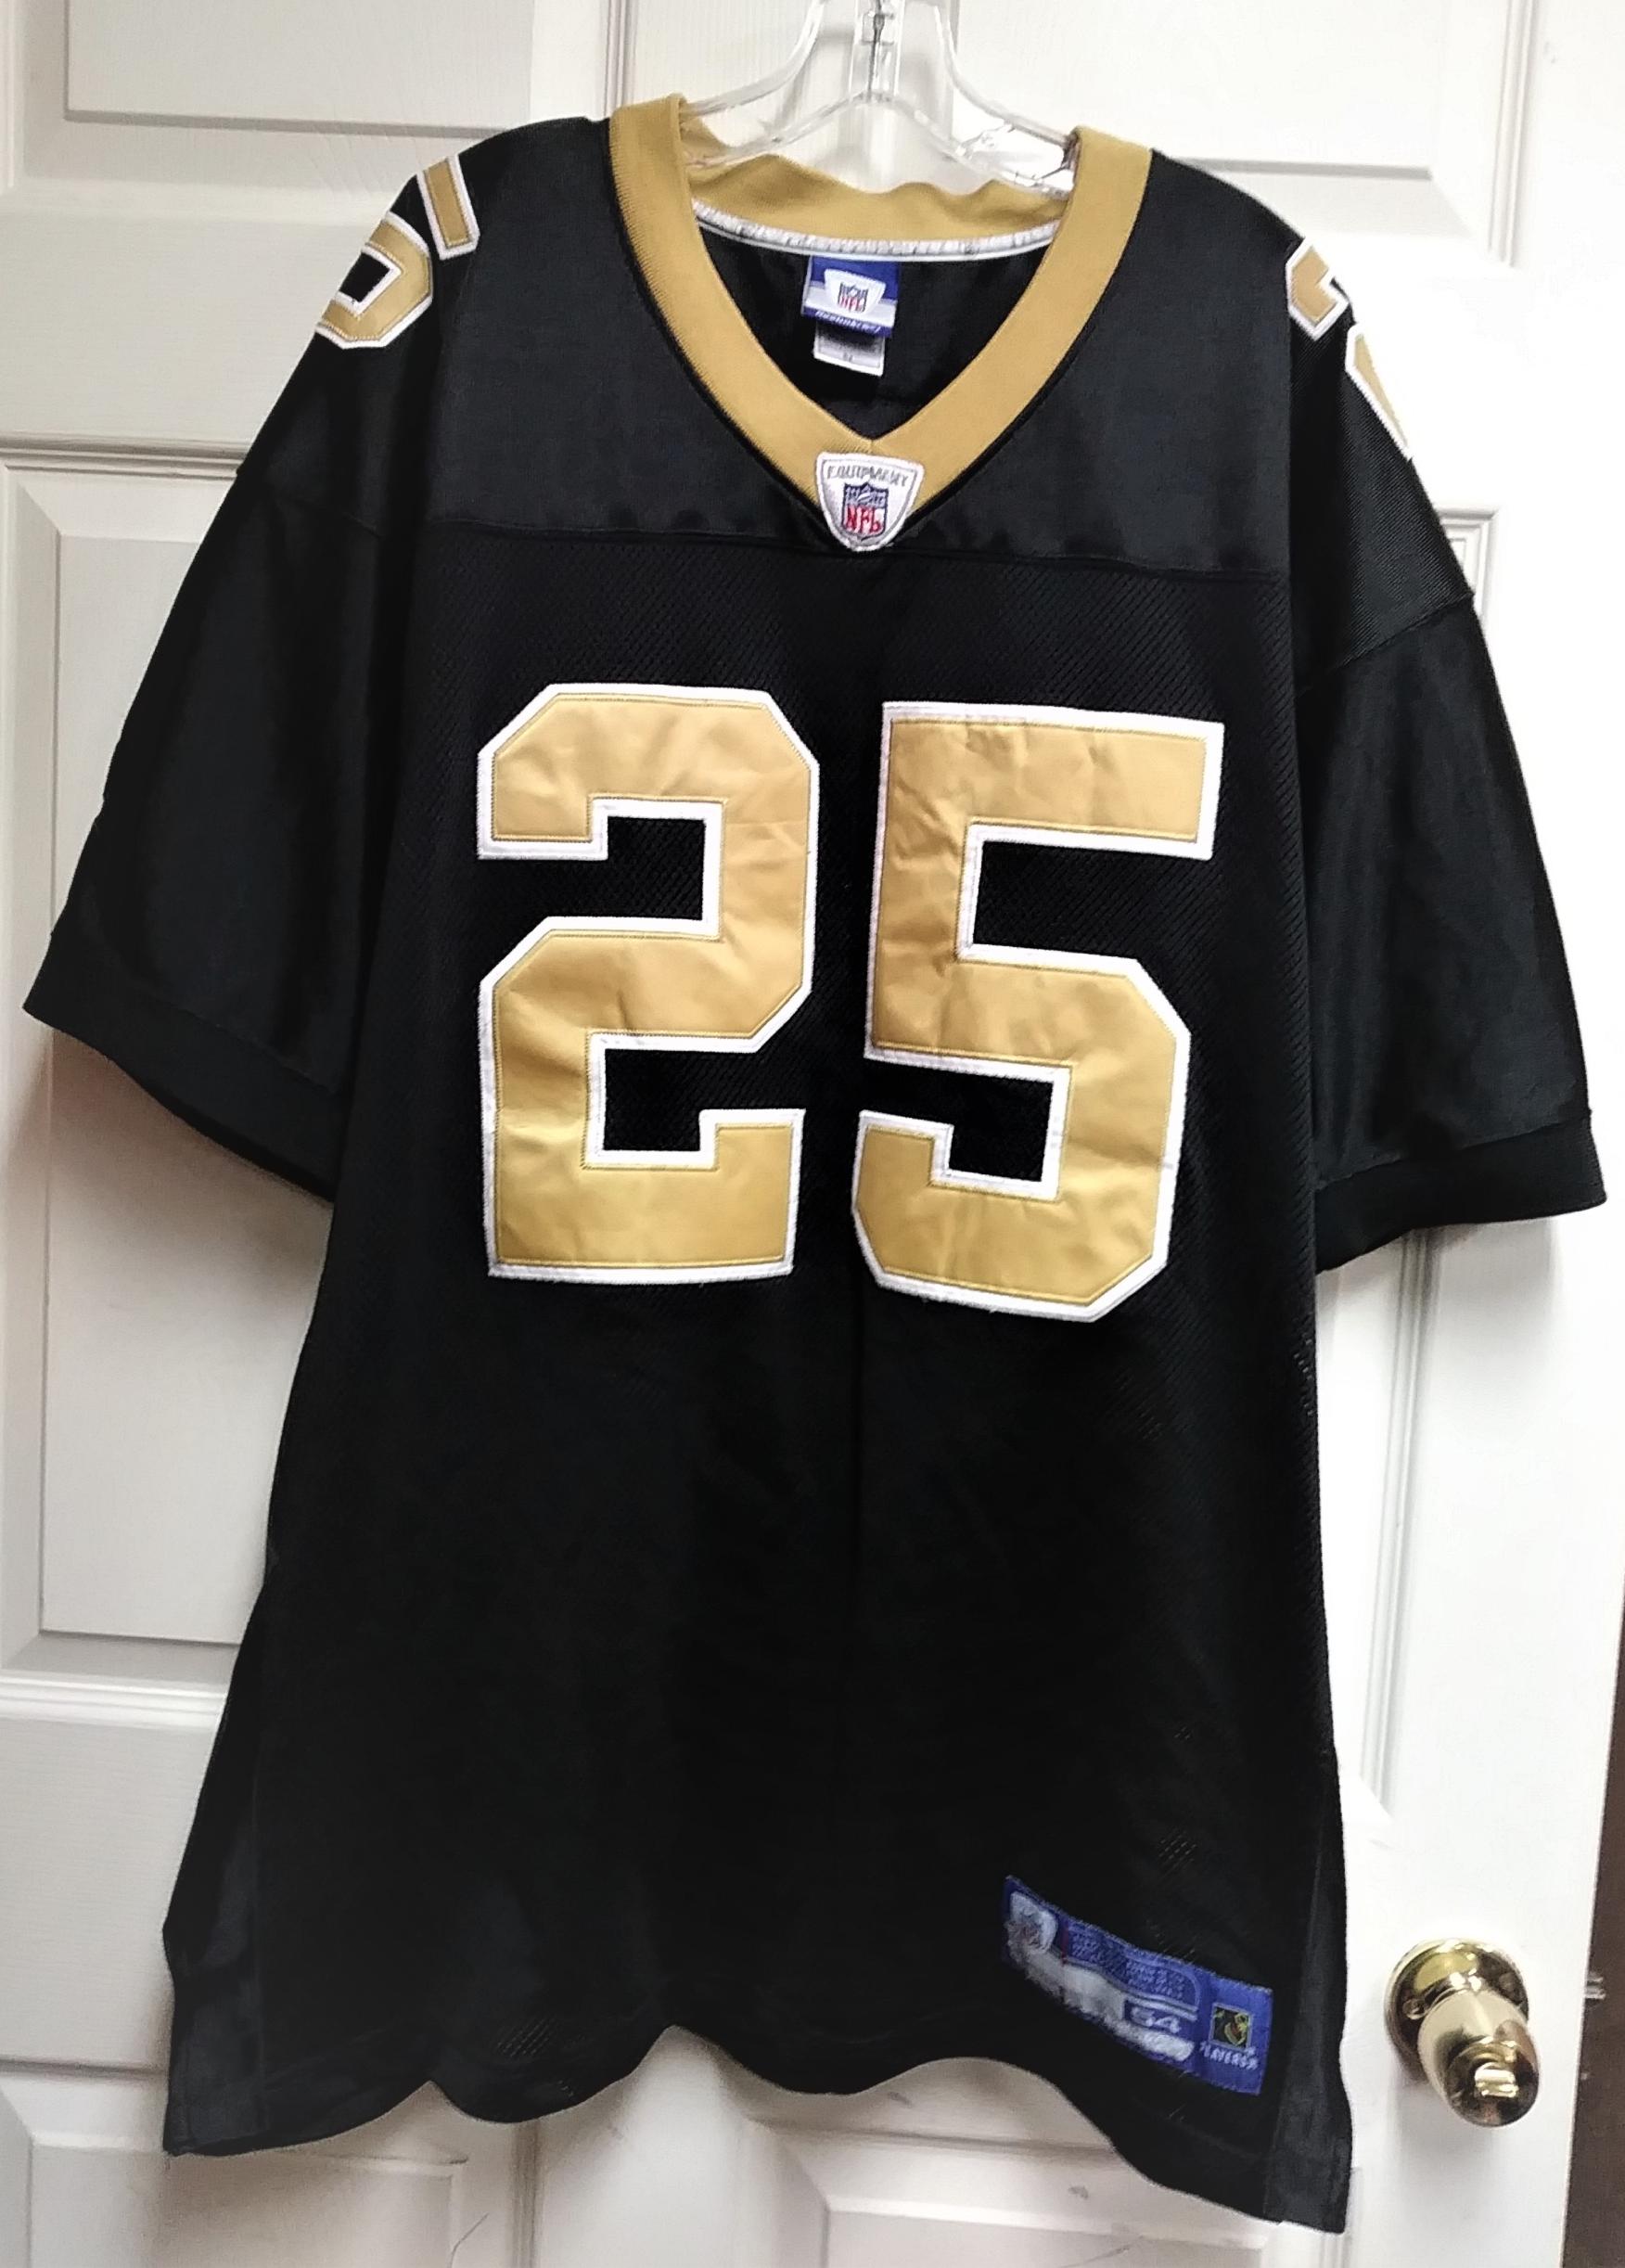 Reebok NFL Equipment Reggie Bush #25 Black Gold New Orleans Saints Jersey Sz 54